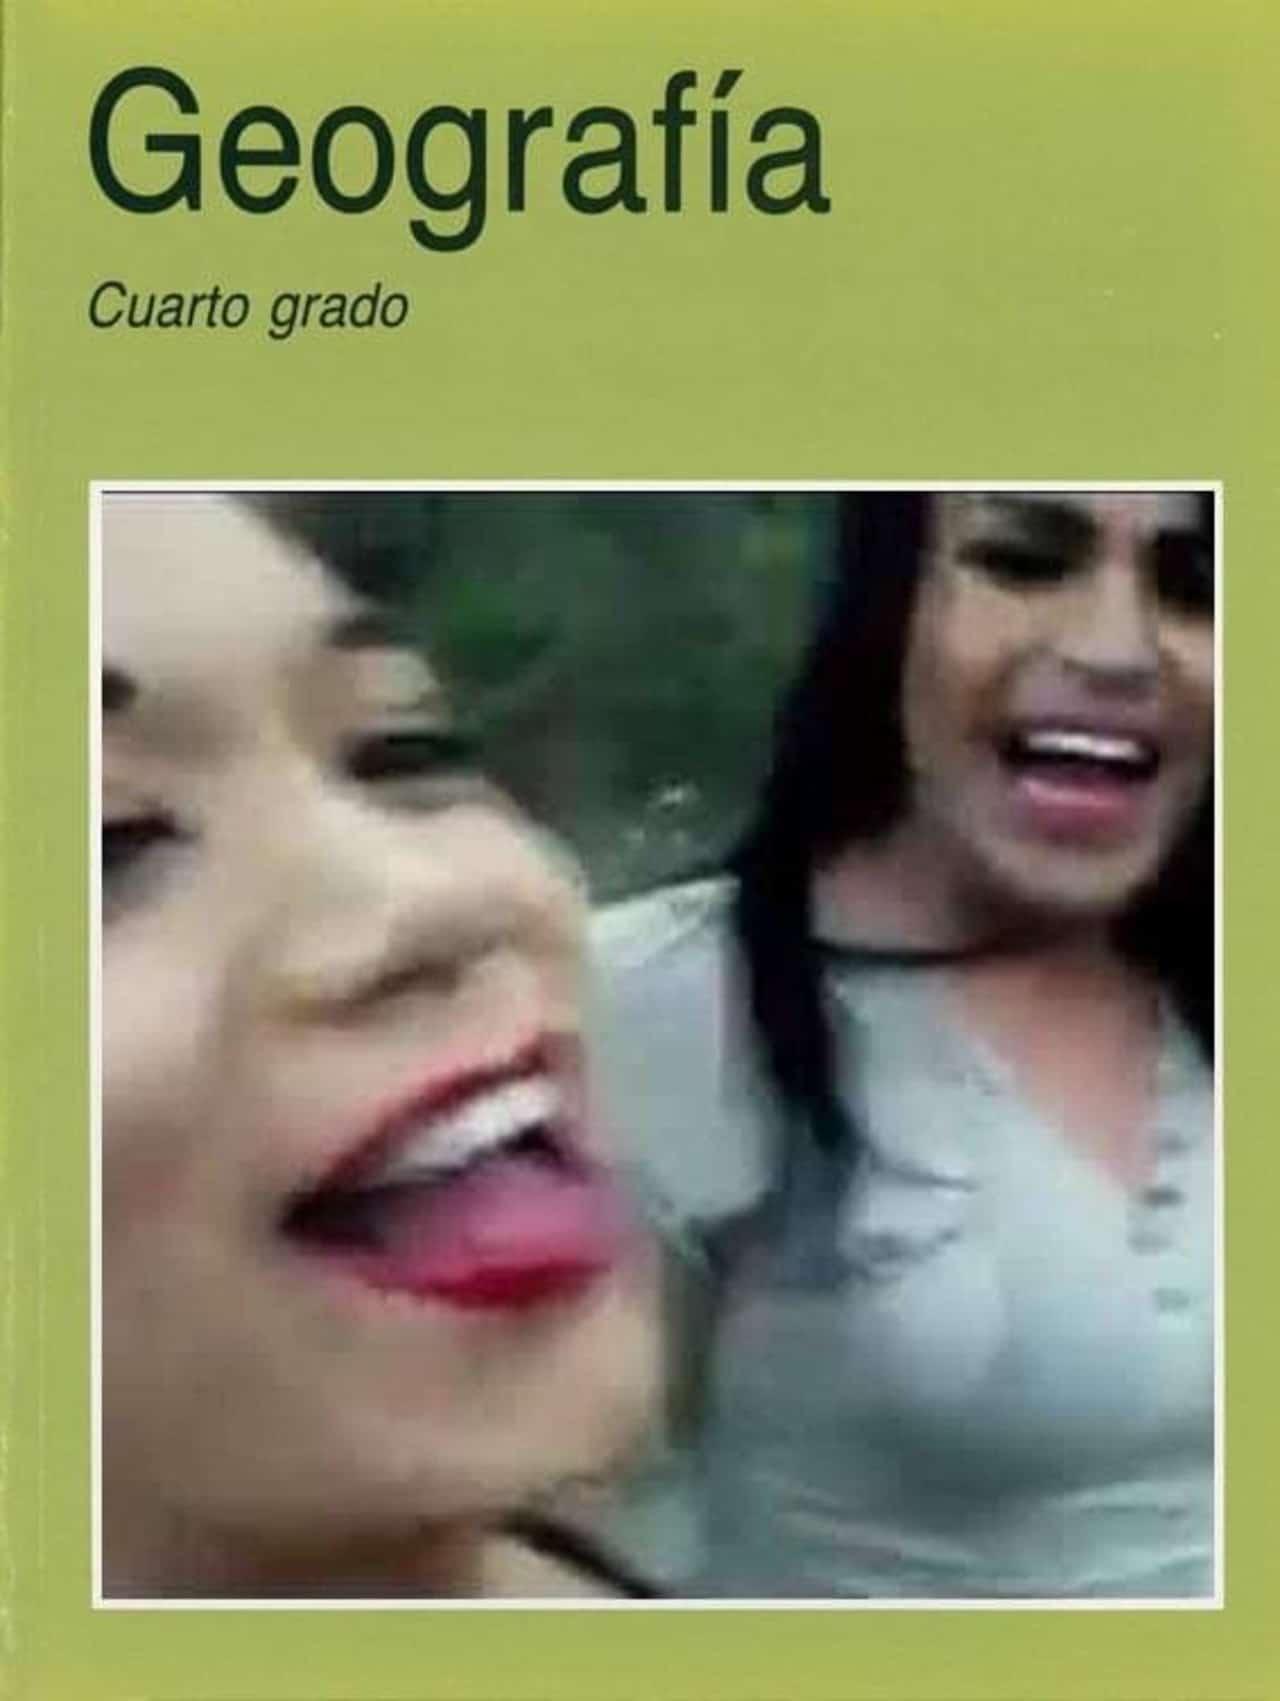 Mejores memes portadas Memes libros de texto sep